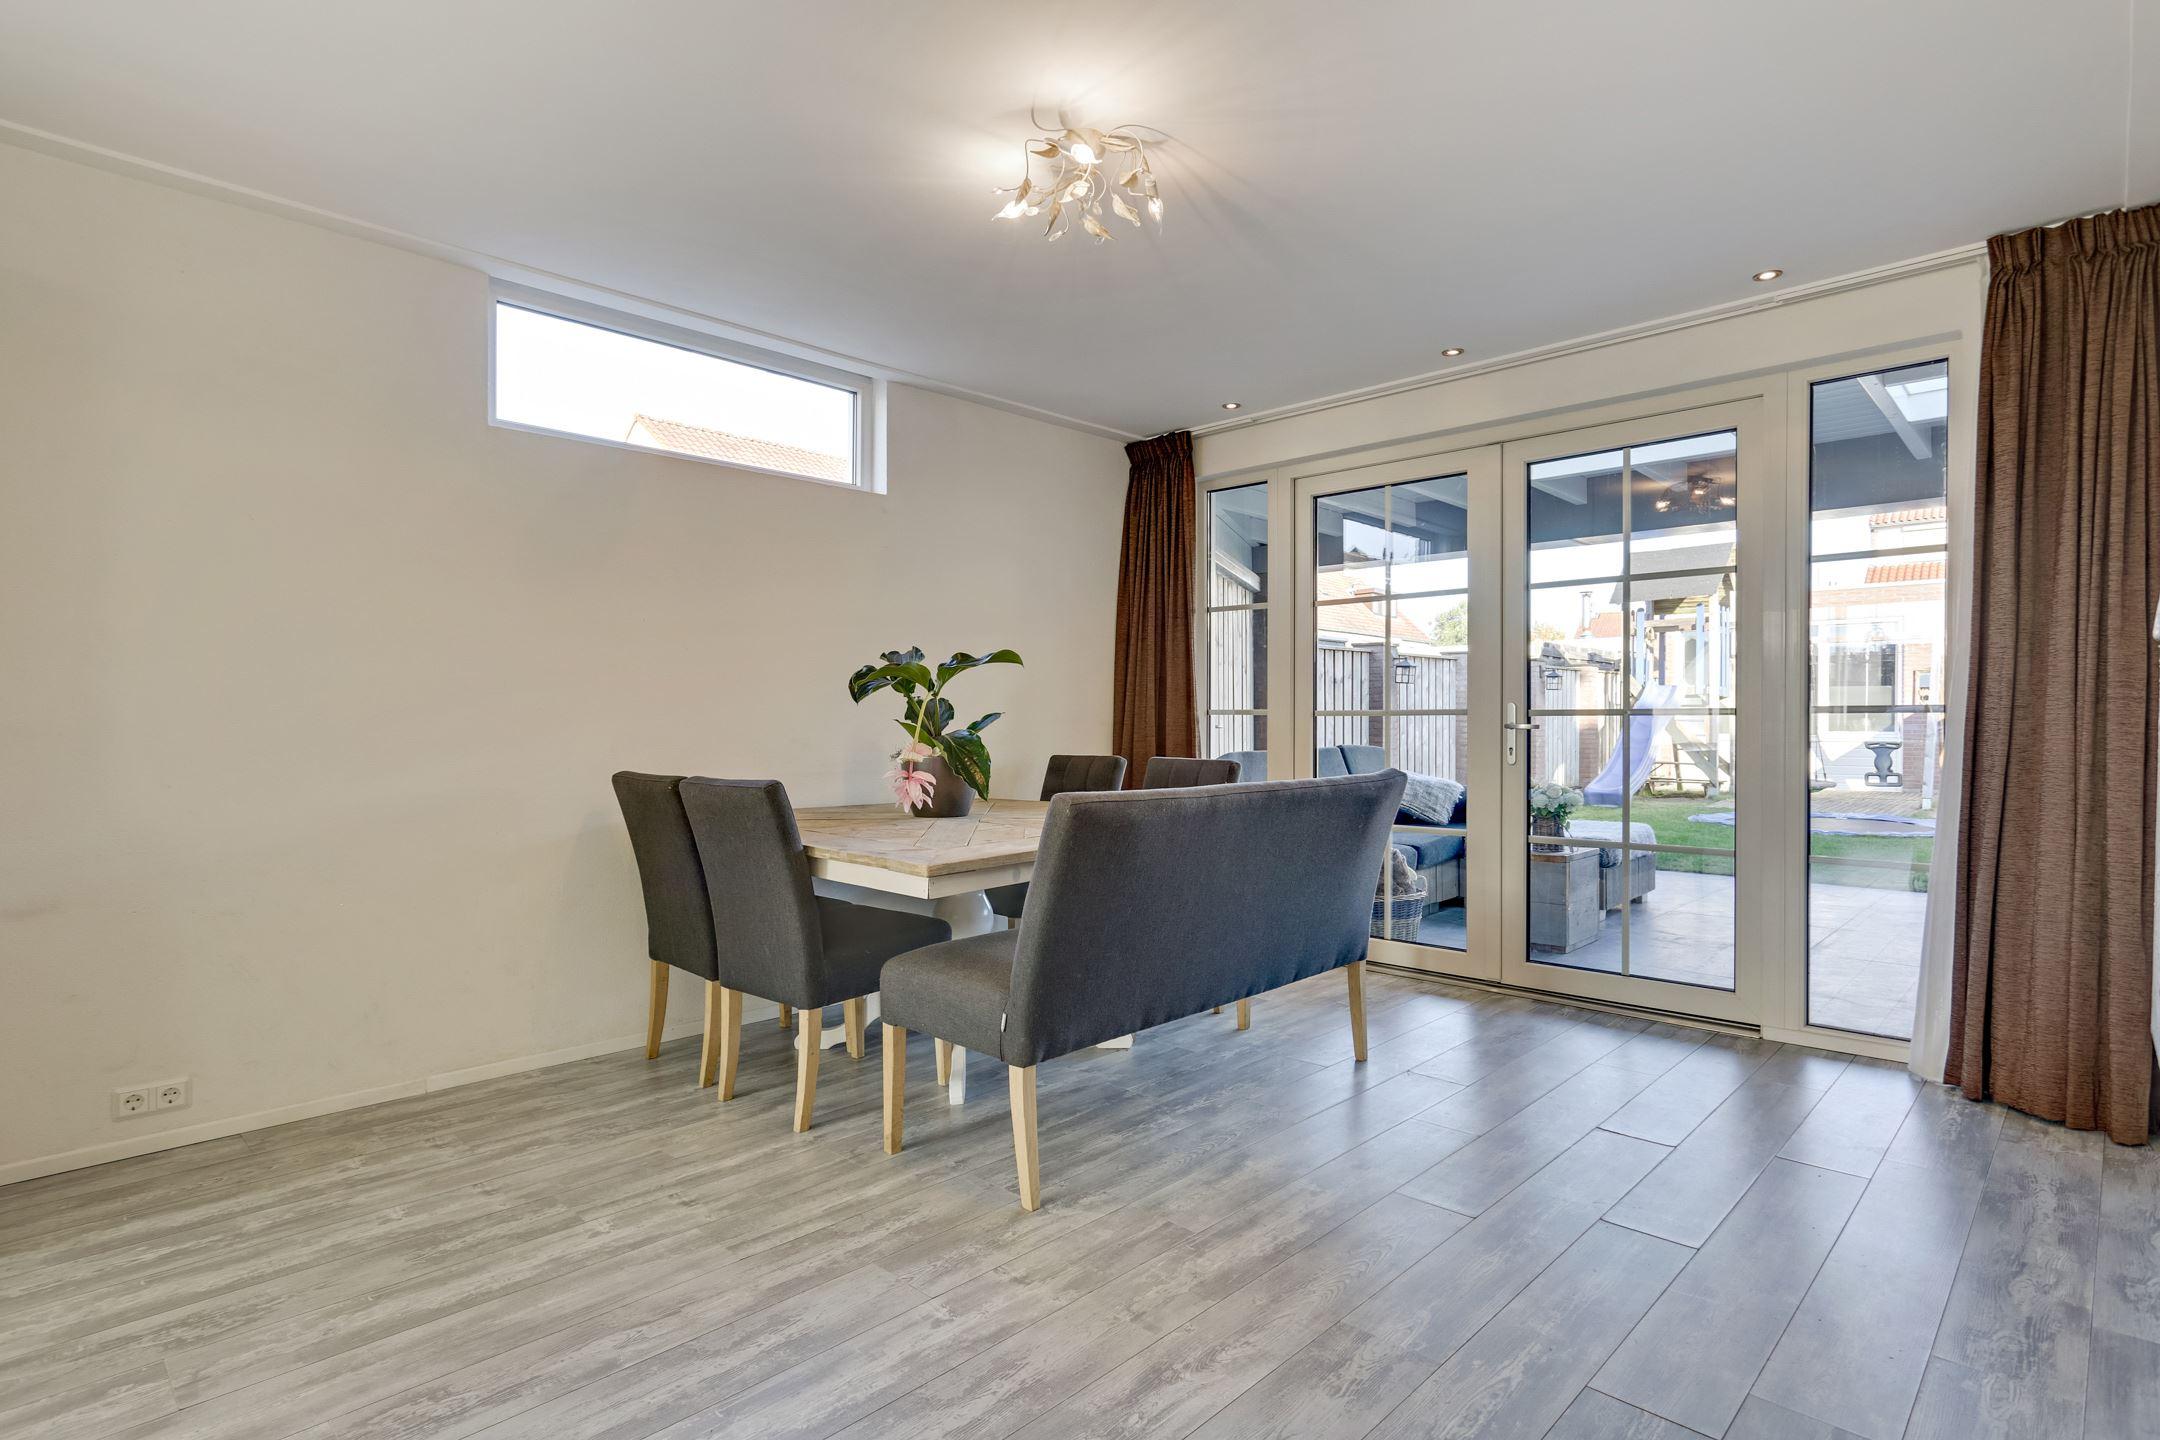 Huis te koop: Gruttostraat 1 5667 PW Geldrop [funda]